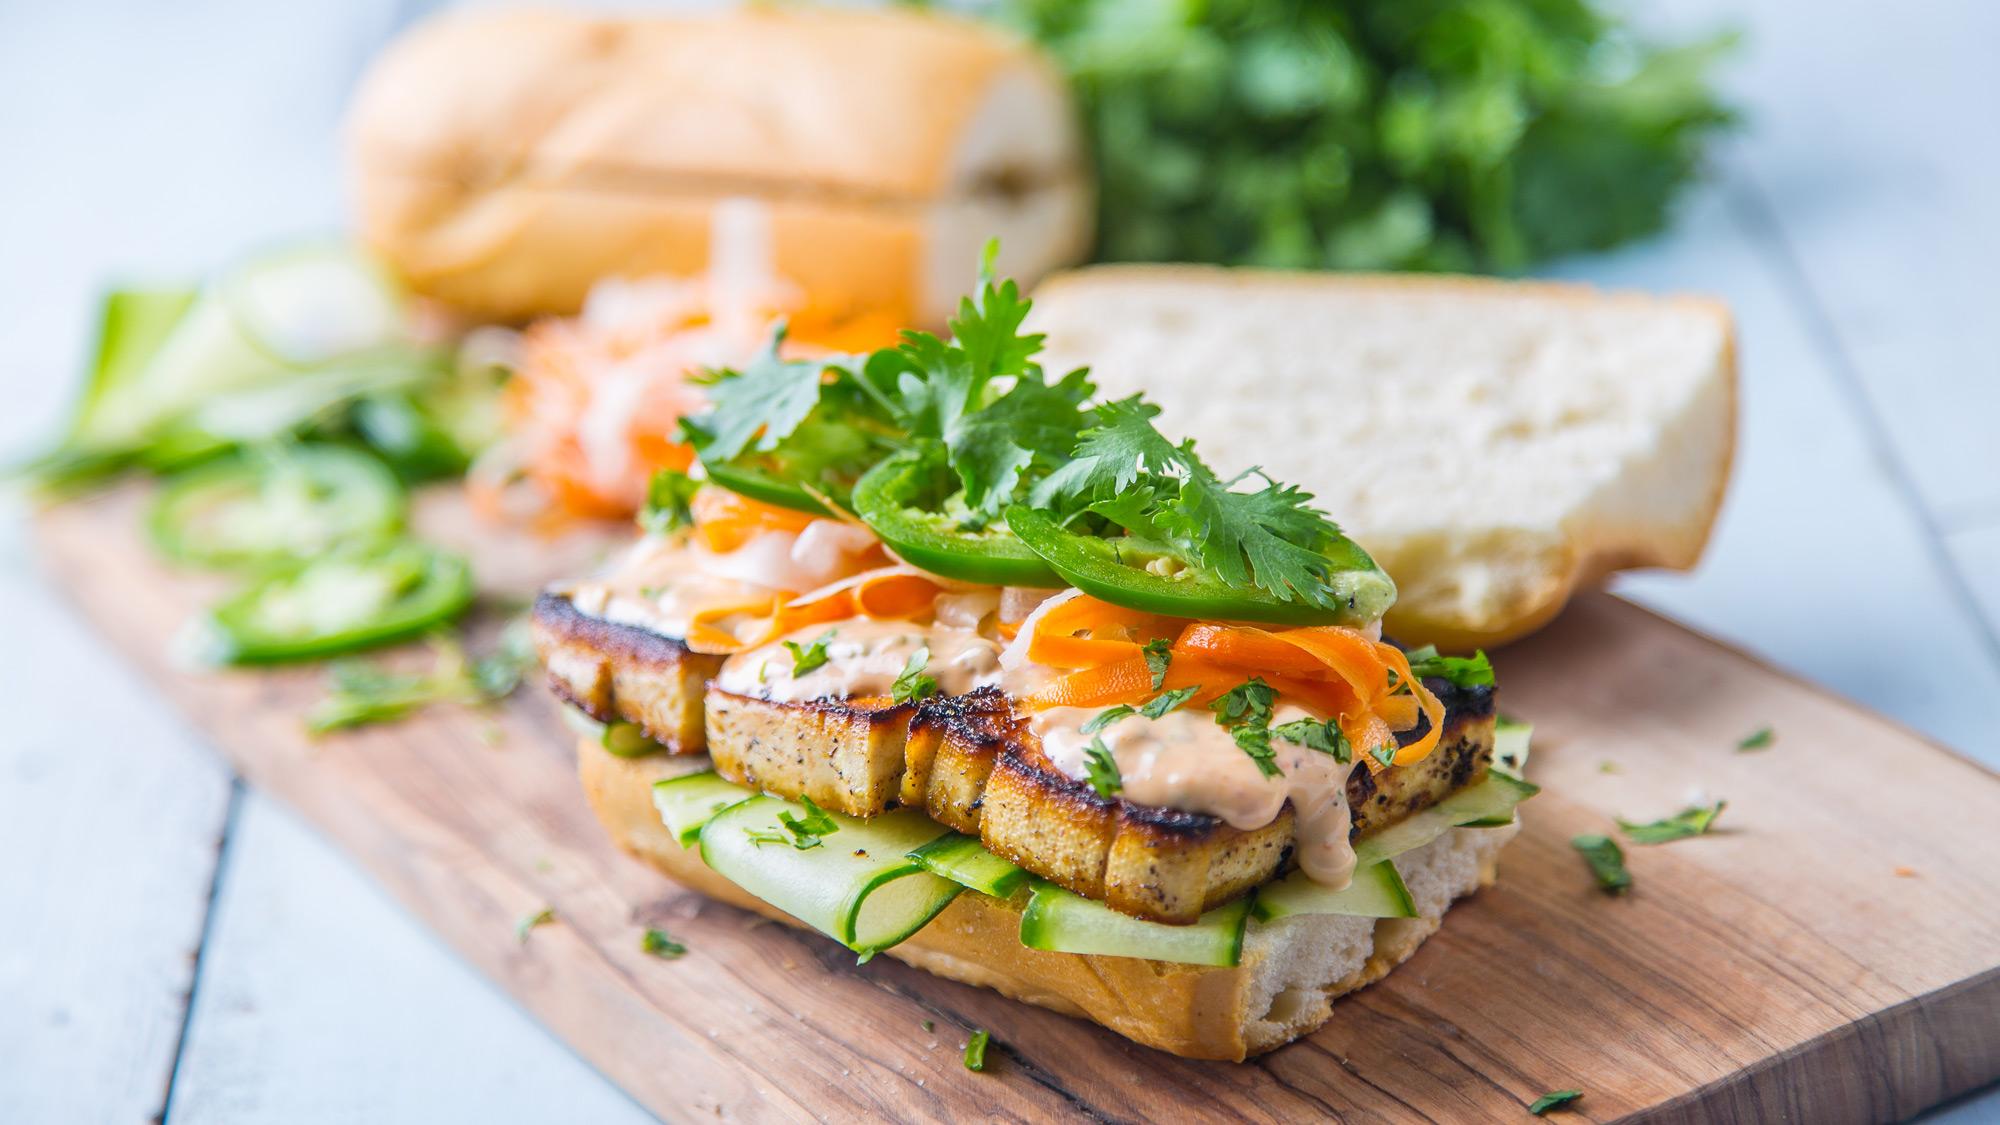 vegan tofu meal prep banh mi sandwich